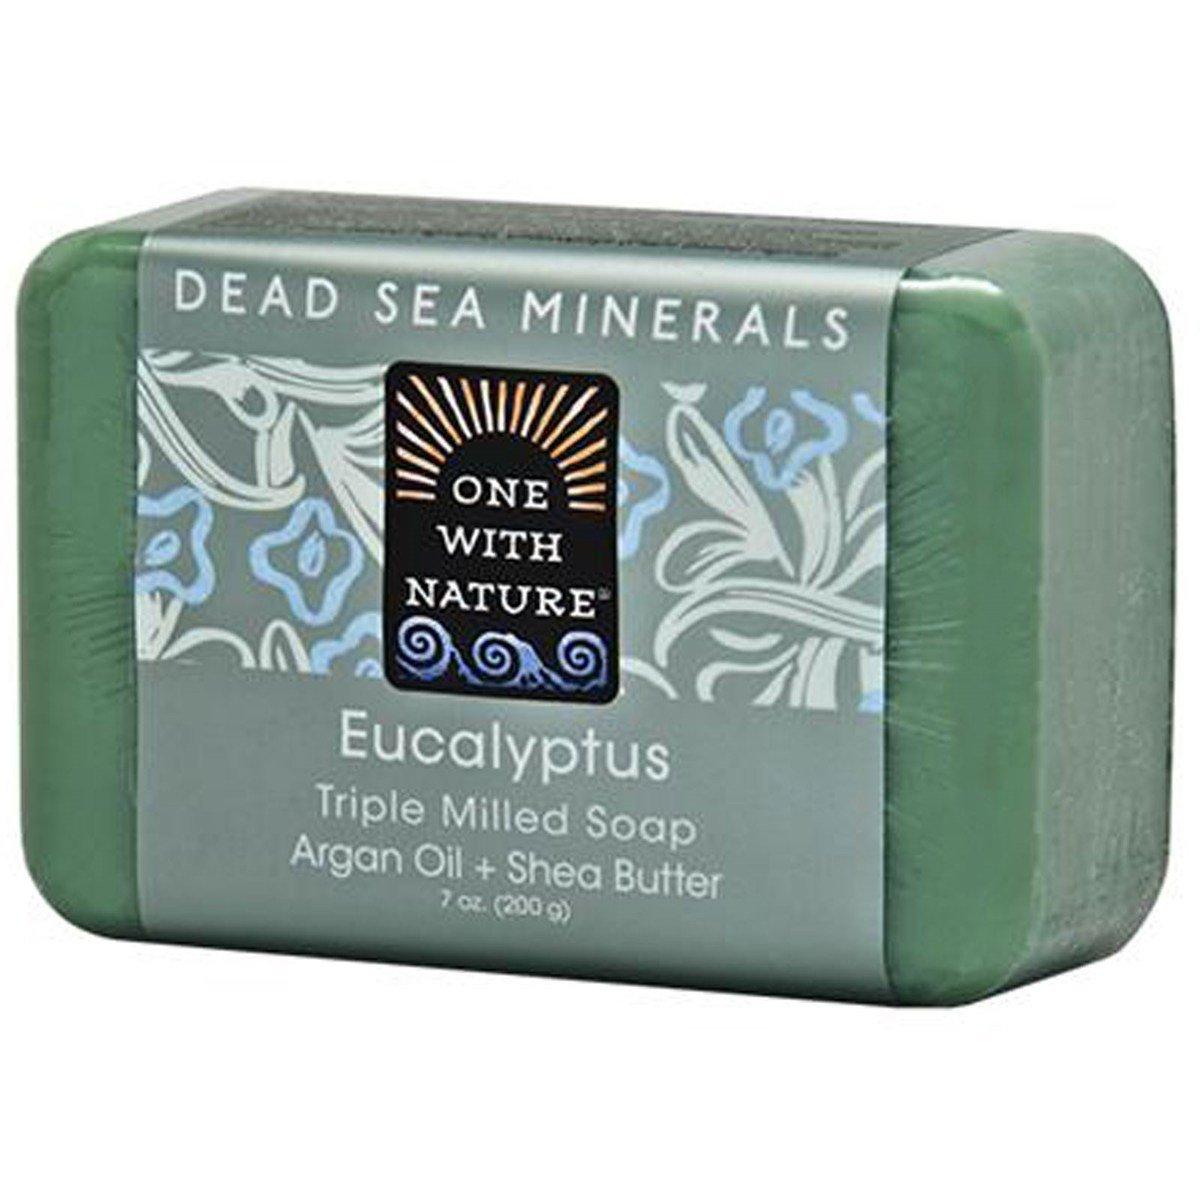 One with Nature 死海礦物尤加利香皂